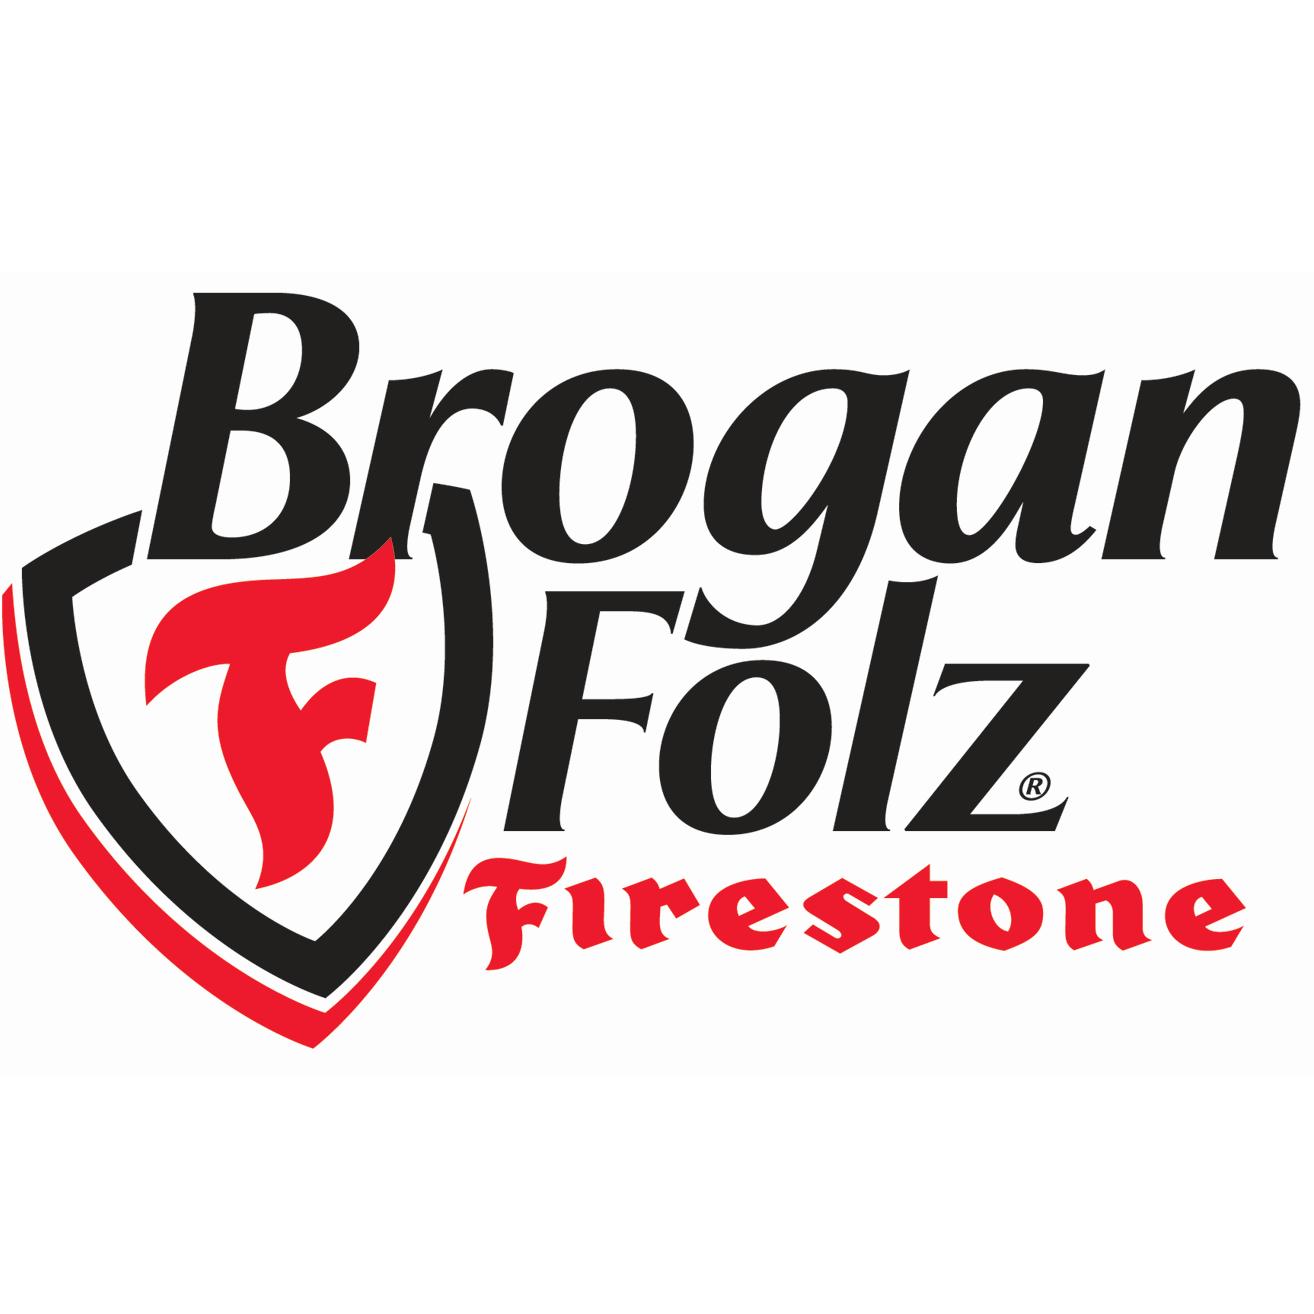 Brogan & Folz Firestone